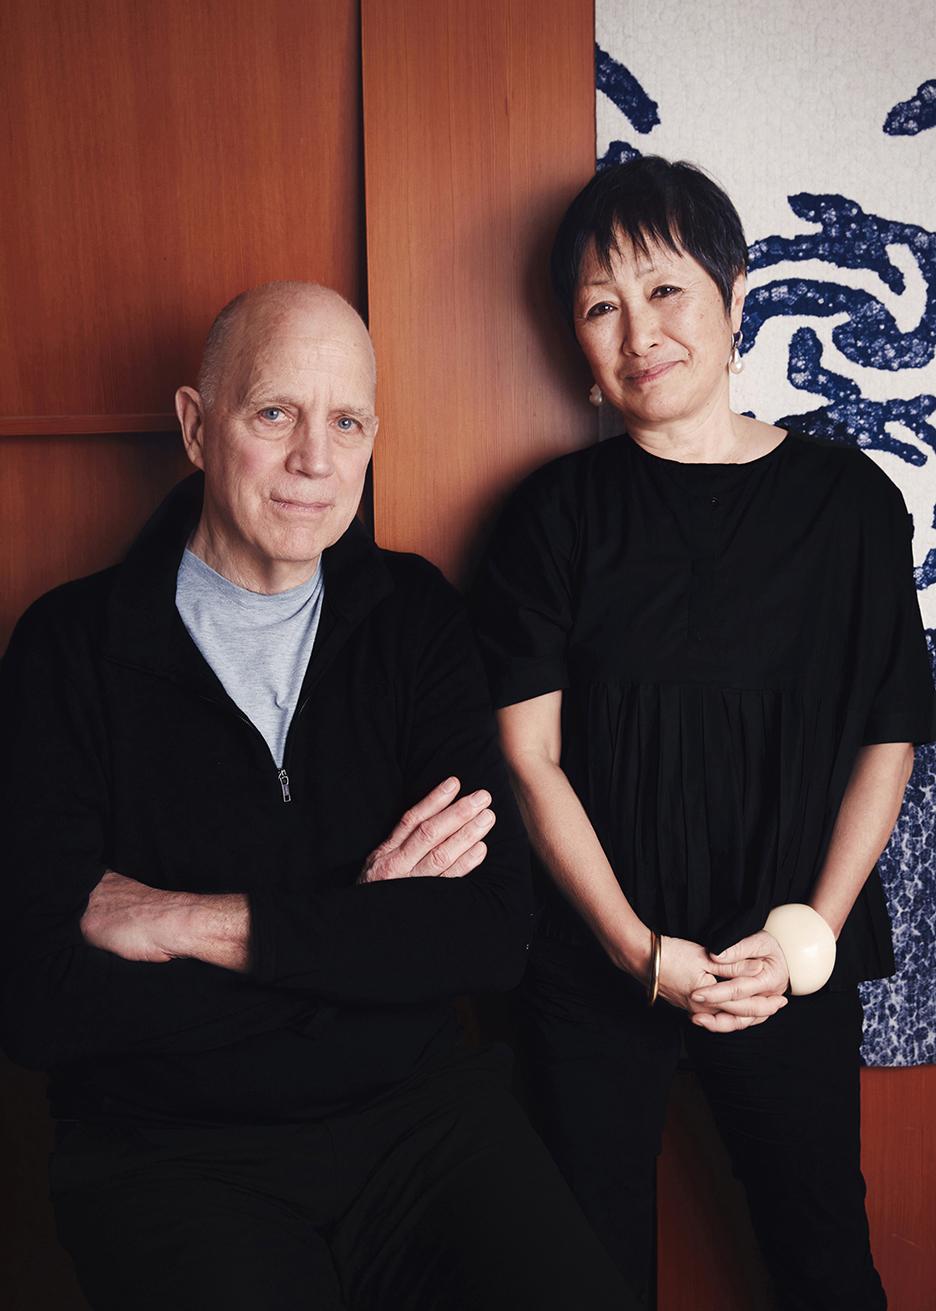 Tod Williams and Billie Tsien win 2019 Praemium Imperiale for architecture